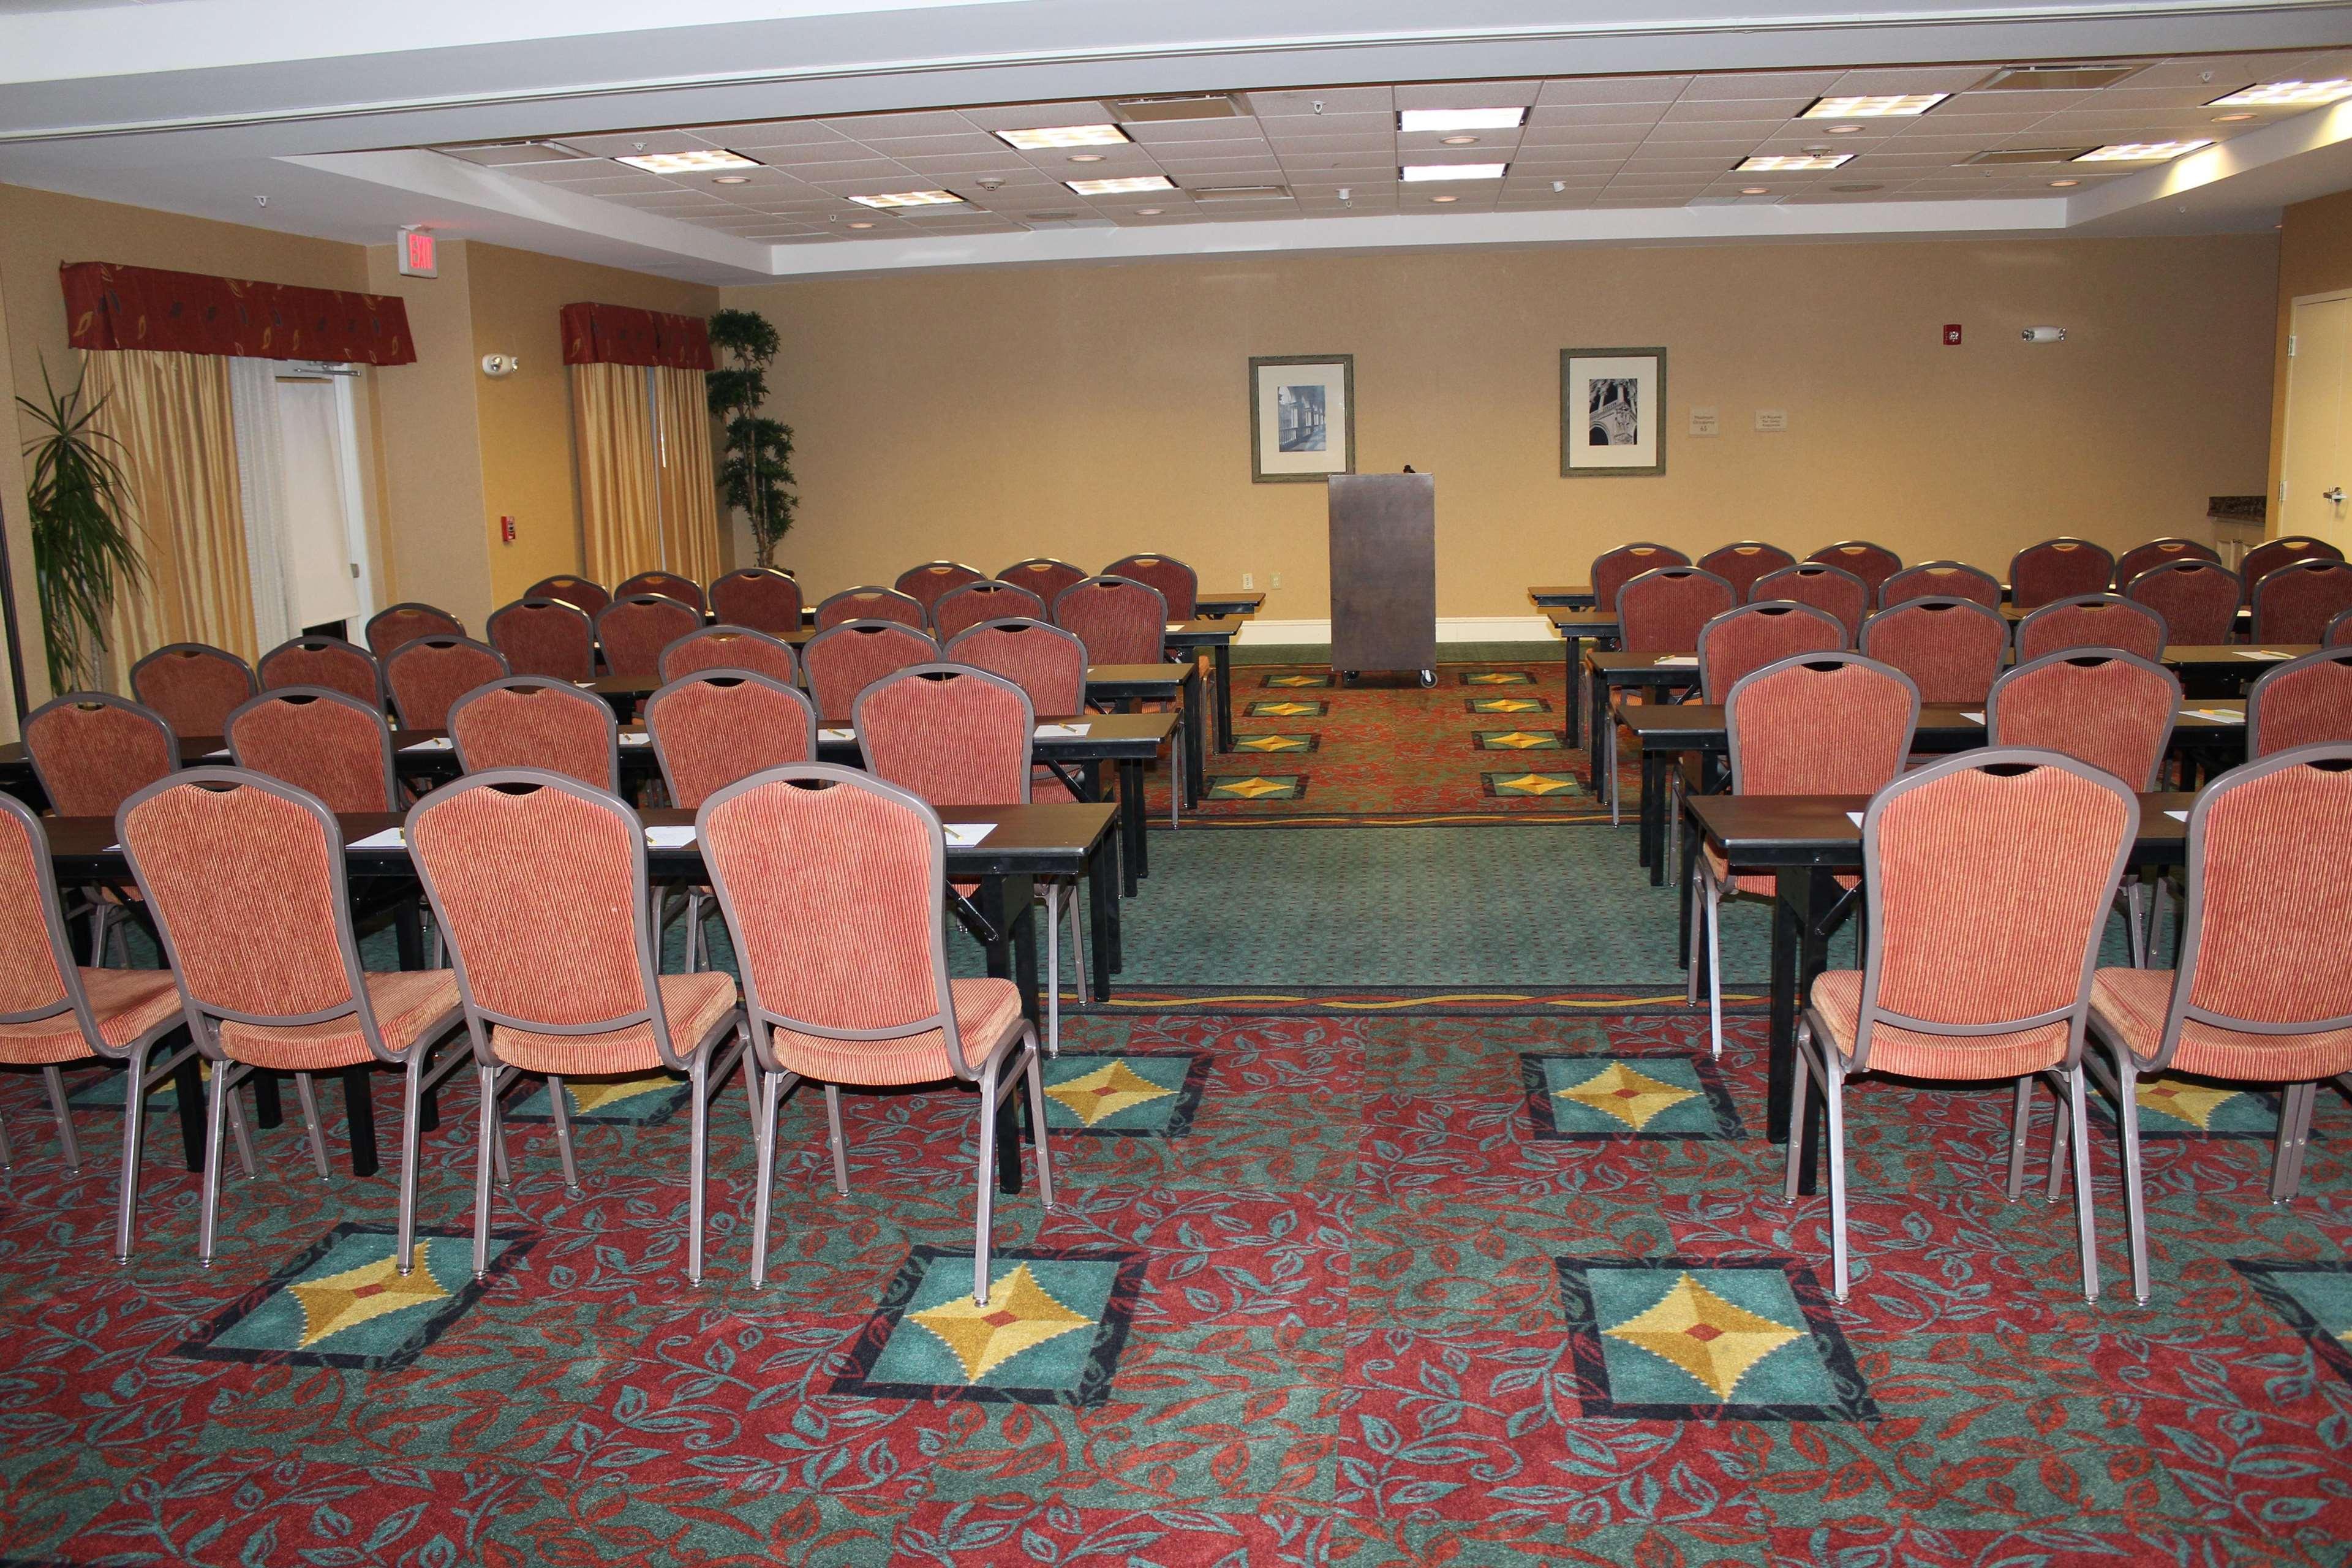 Hilton Garden Inn Fort Myers Airport Fgcu In Fort Myers Fl 33913